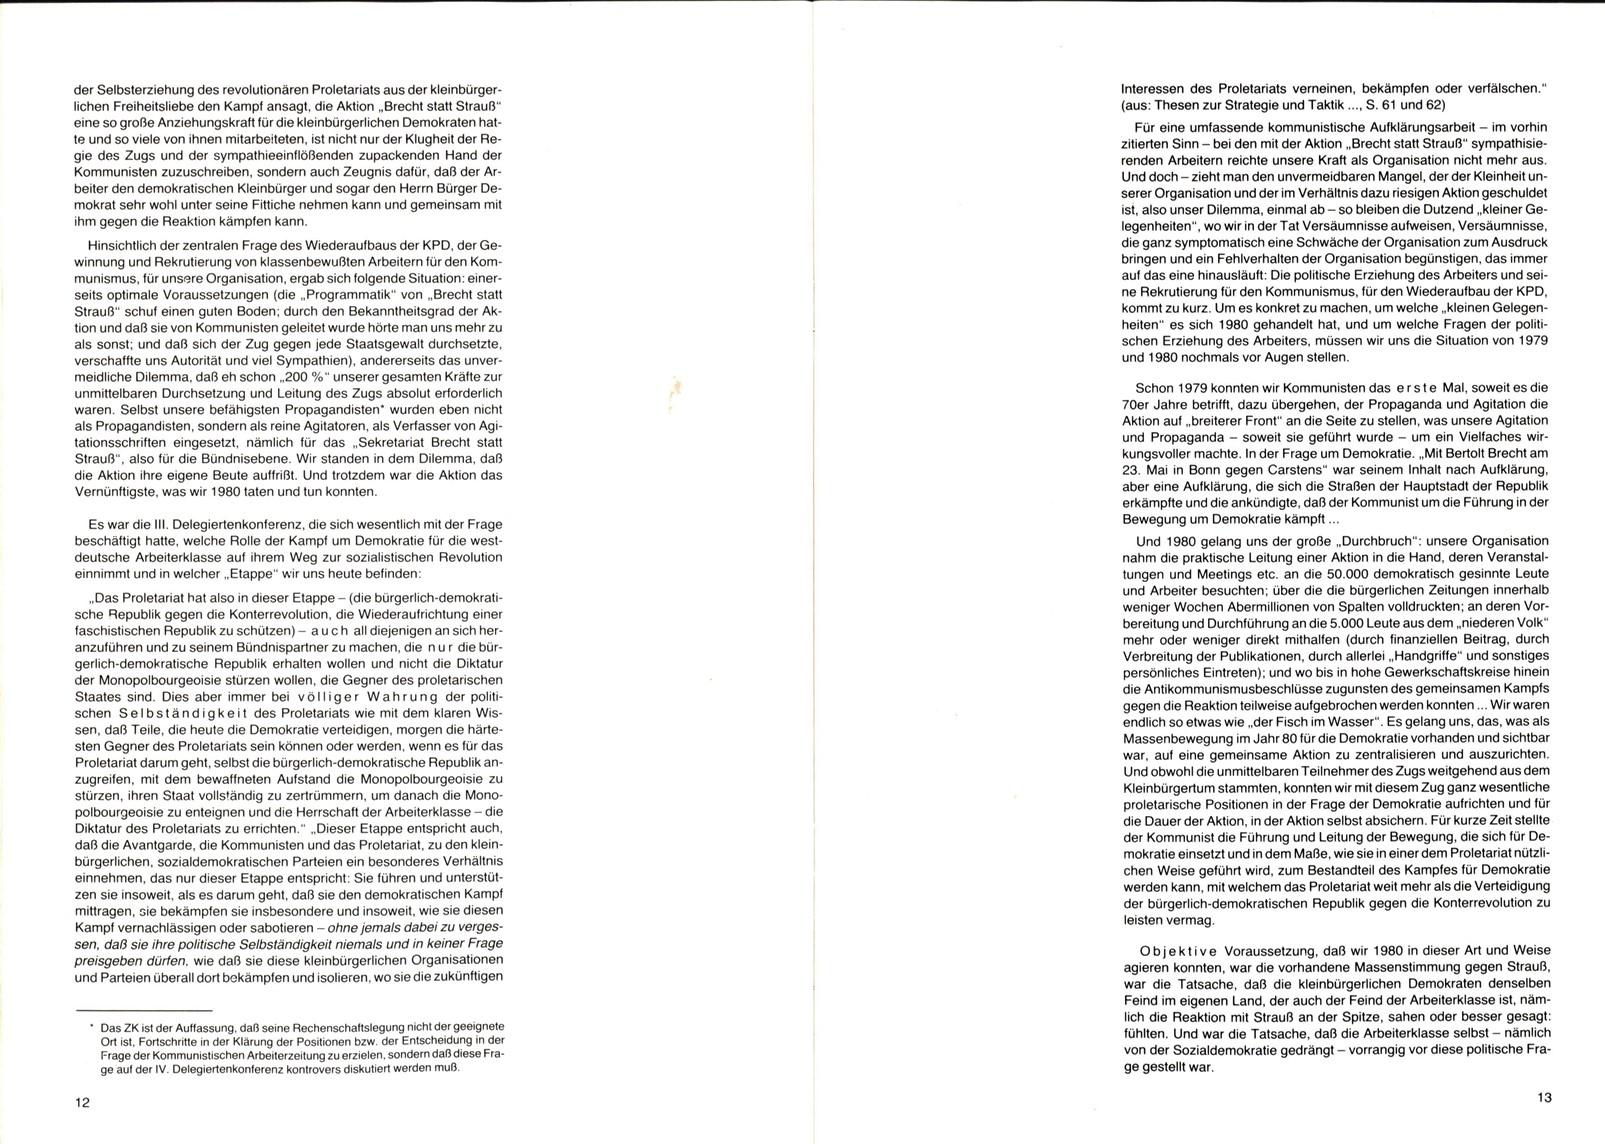 ABG_1985_Beschluesse_IV_Delegiertenkonferenz_08